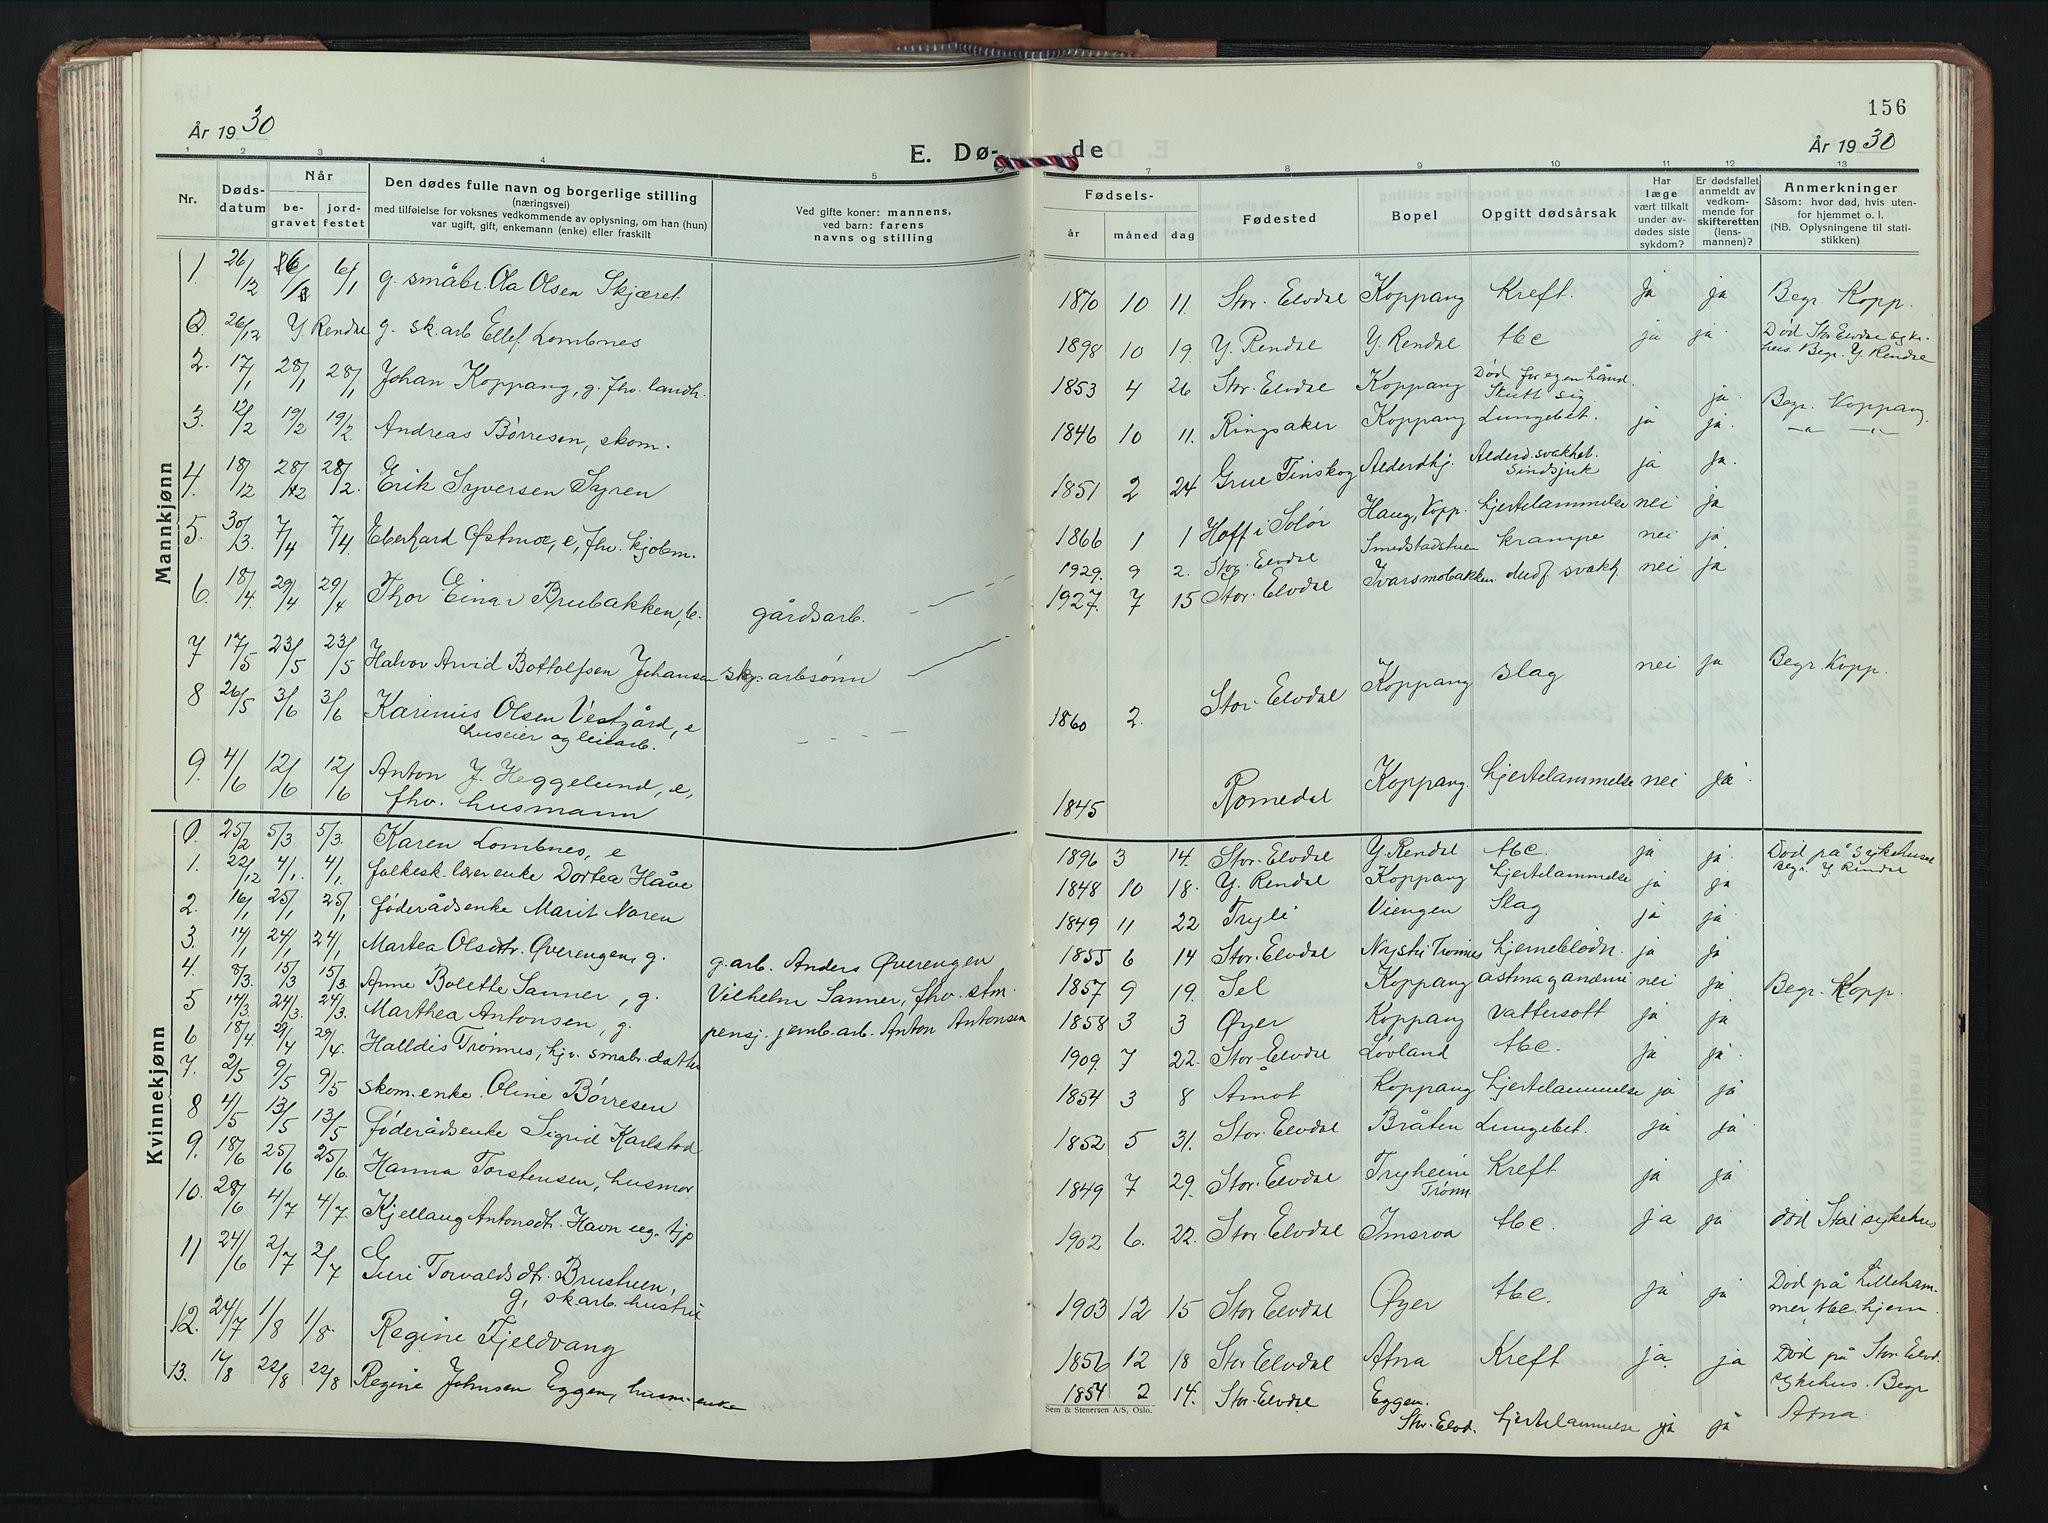 SAH, Stor-Elvdal prestekontor, Klokkerbok nr. 10, 1929-1955, s. 156